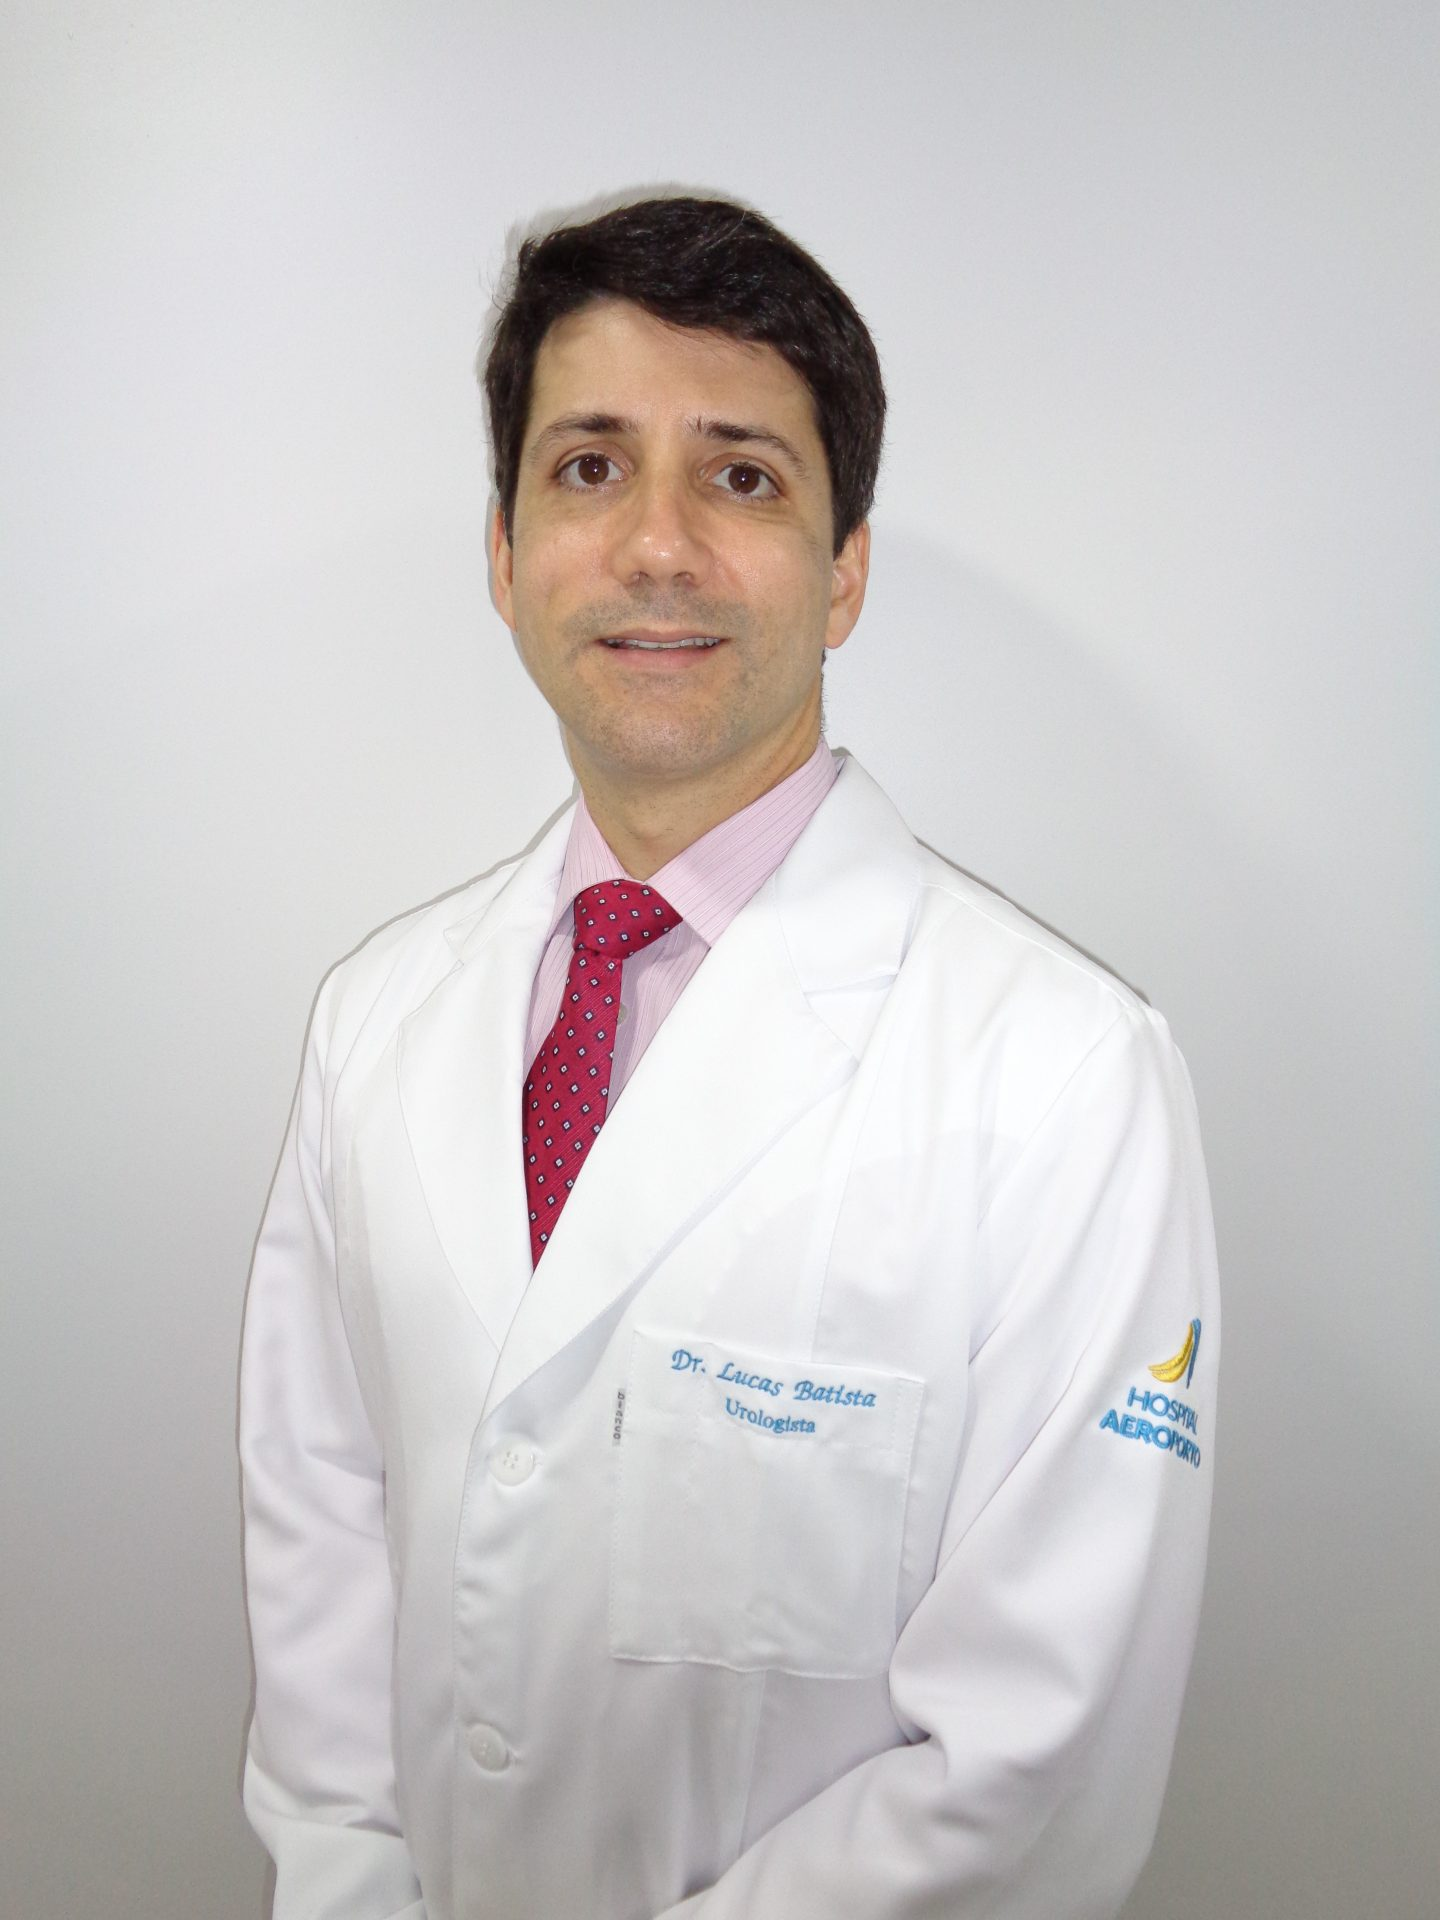 Dr. Lucas Batista